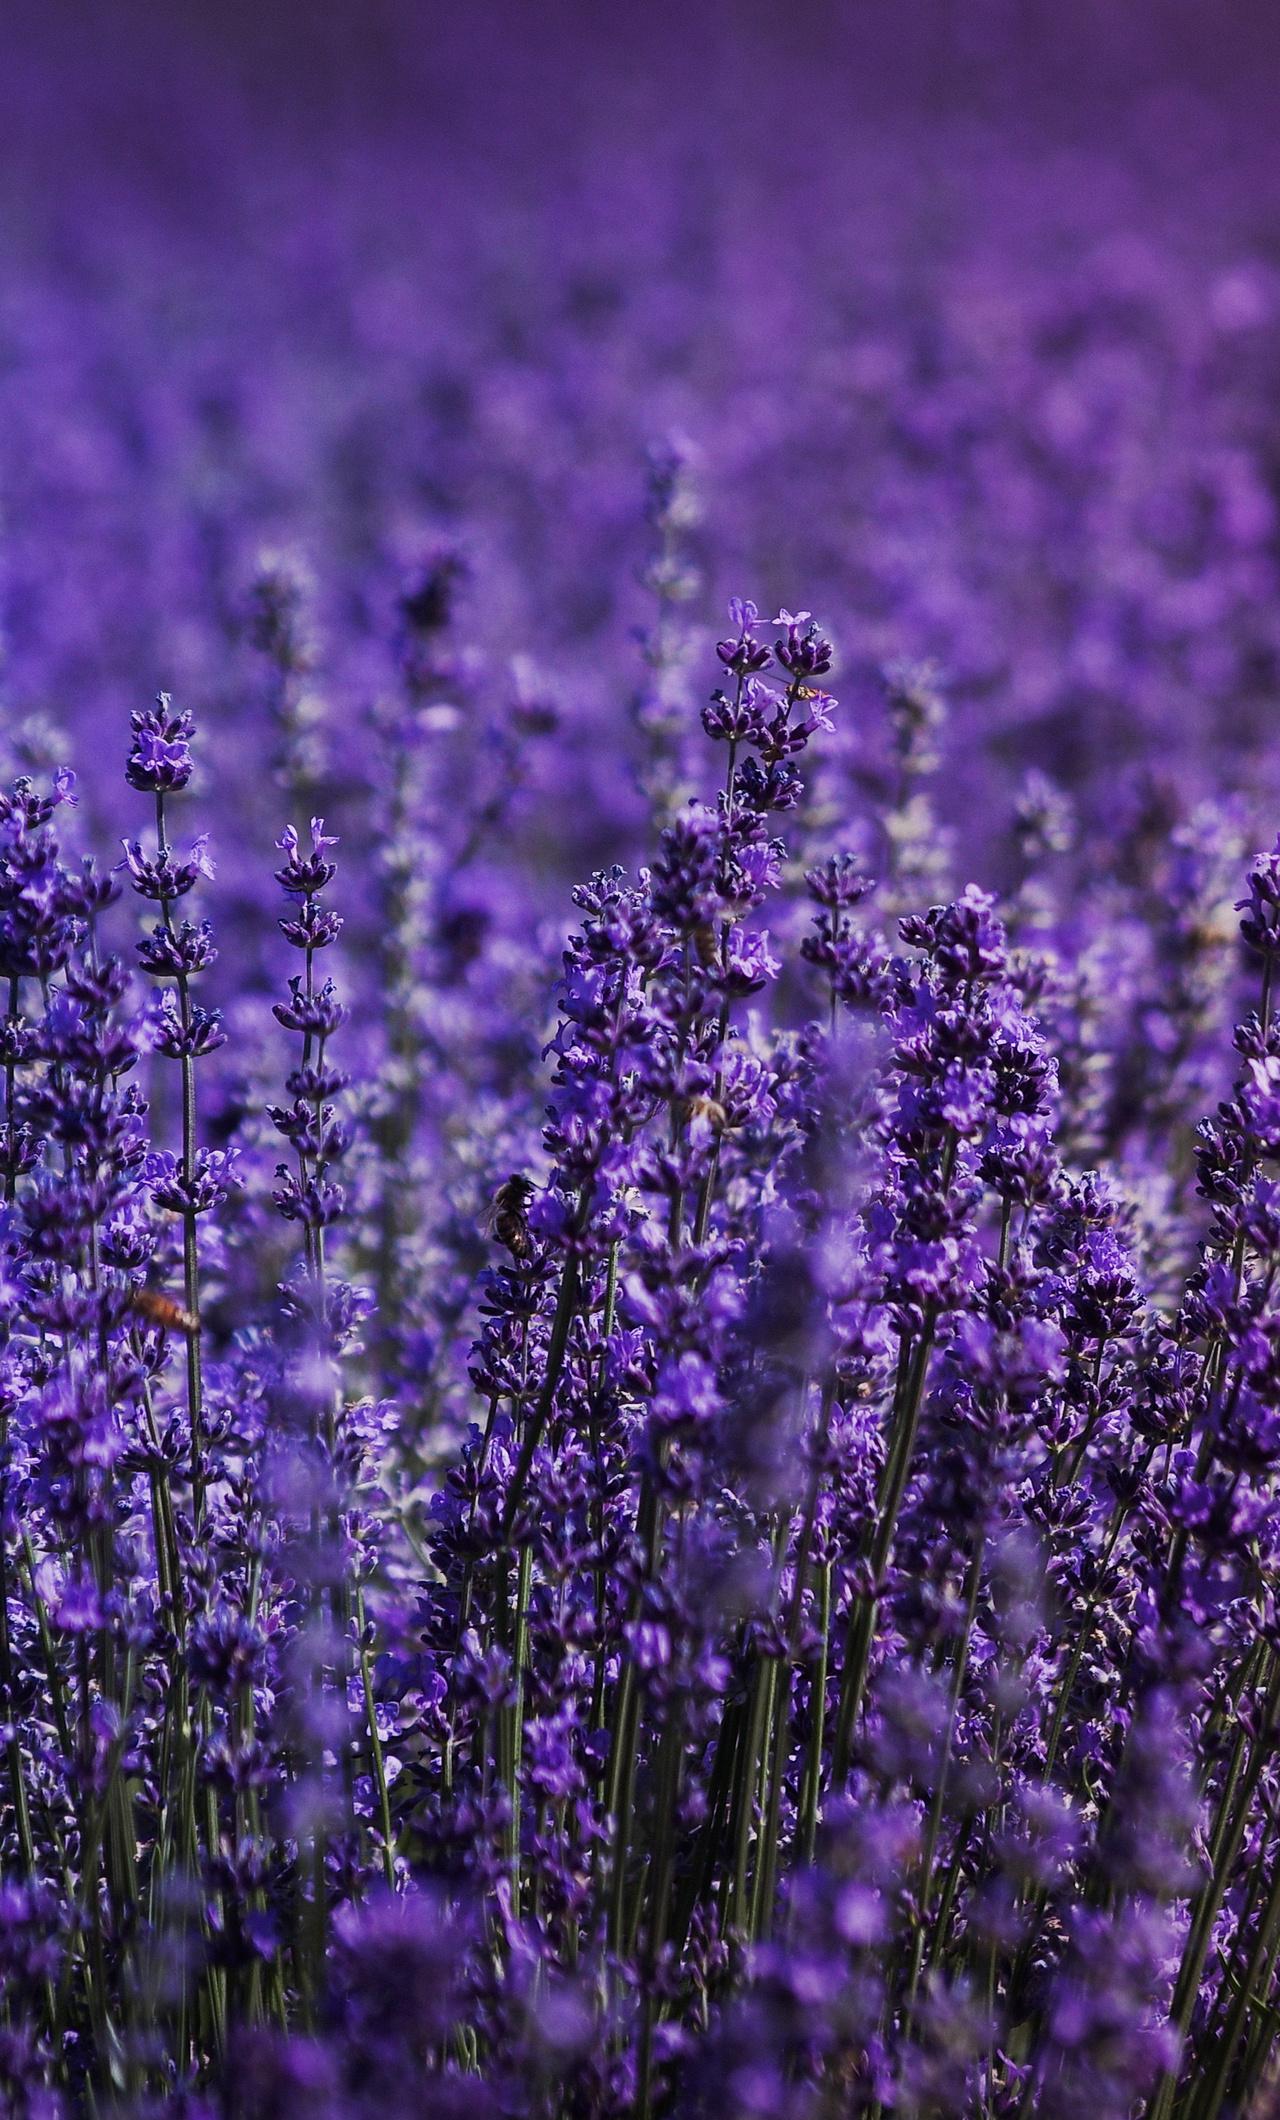 lavender-field-5k-dc.jpg